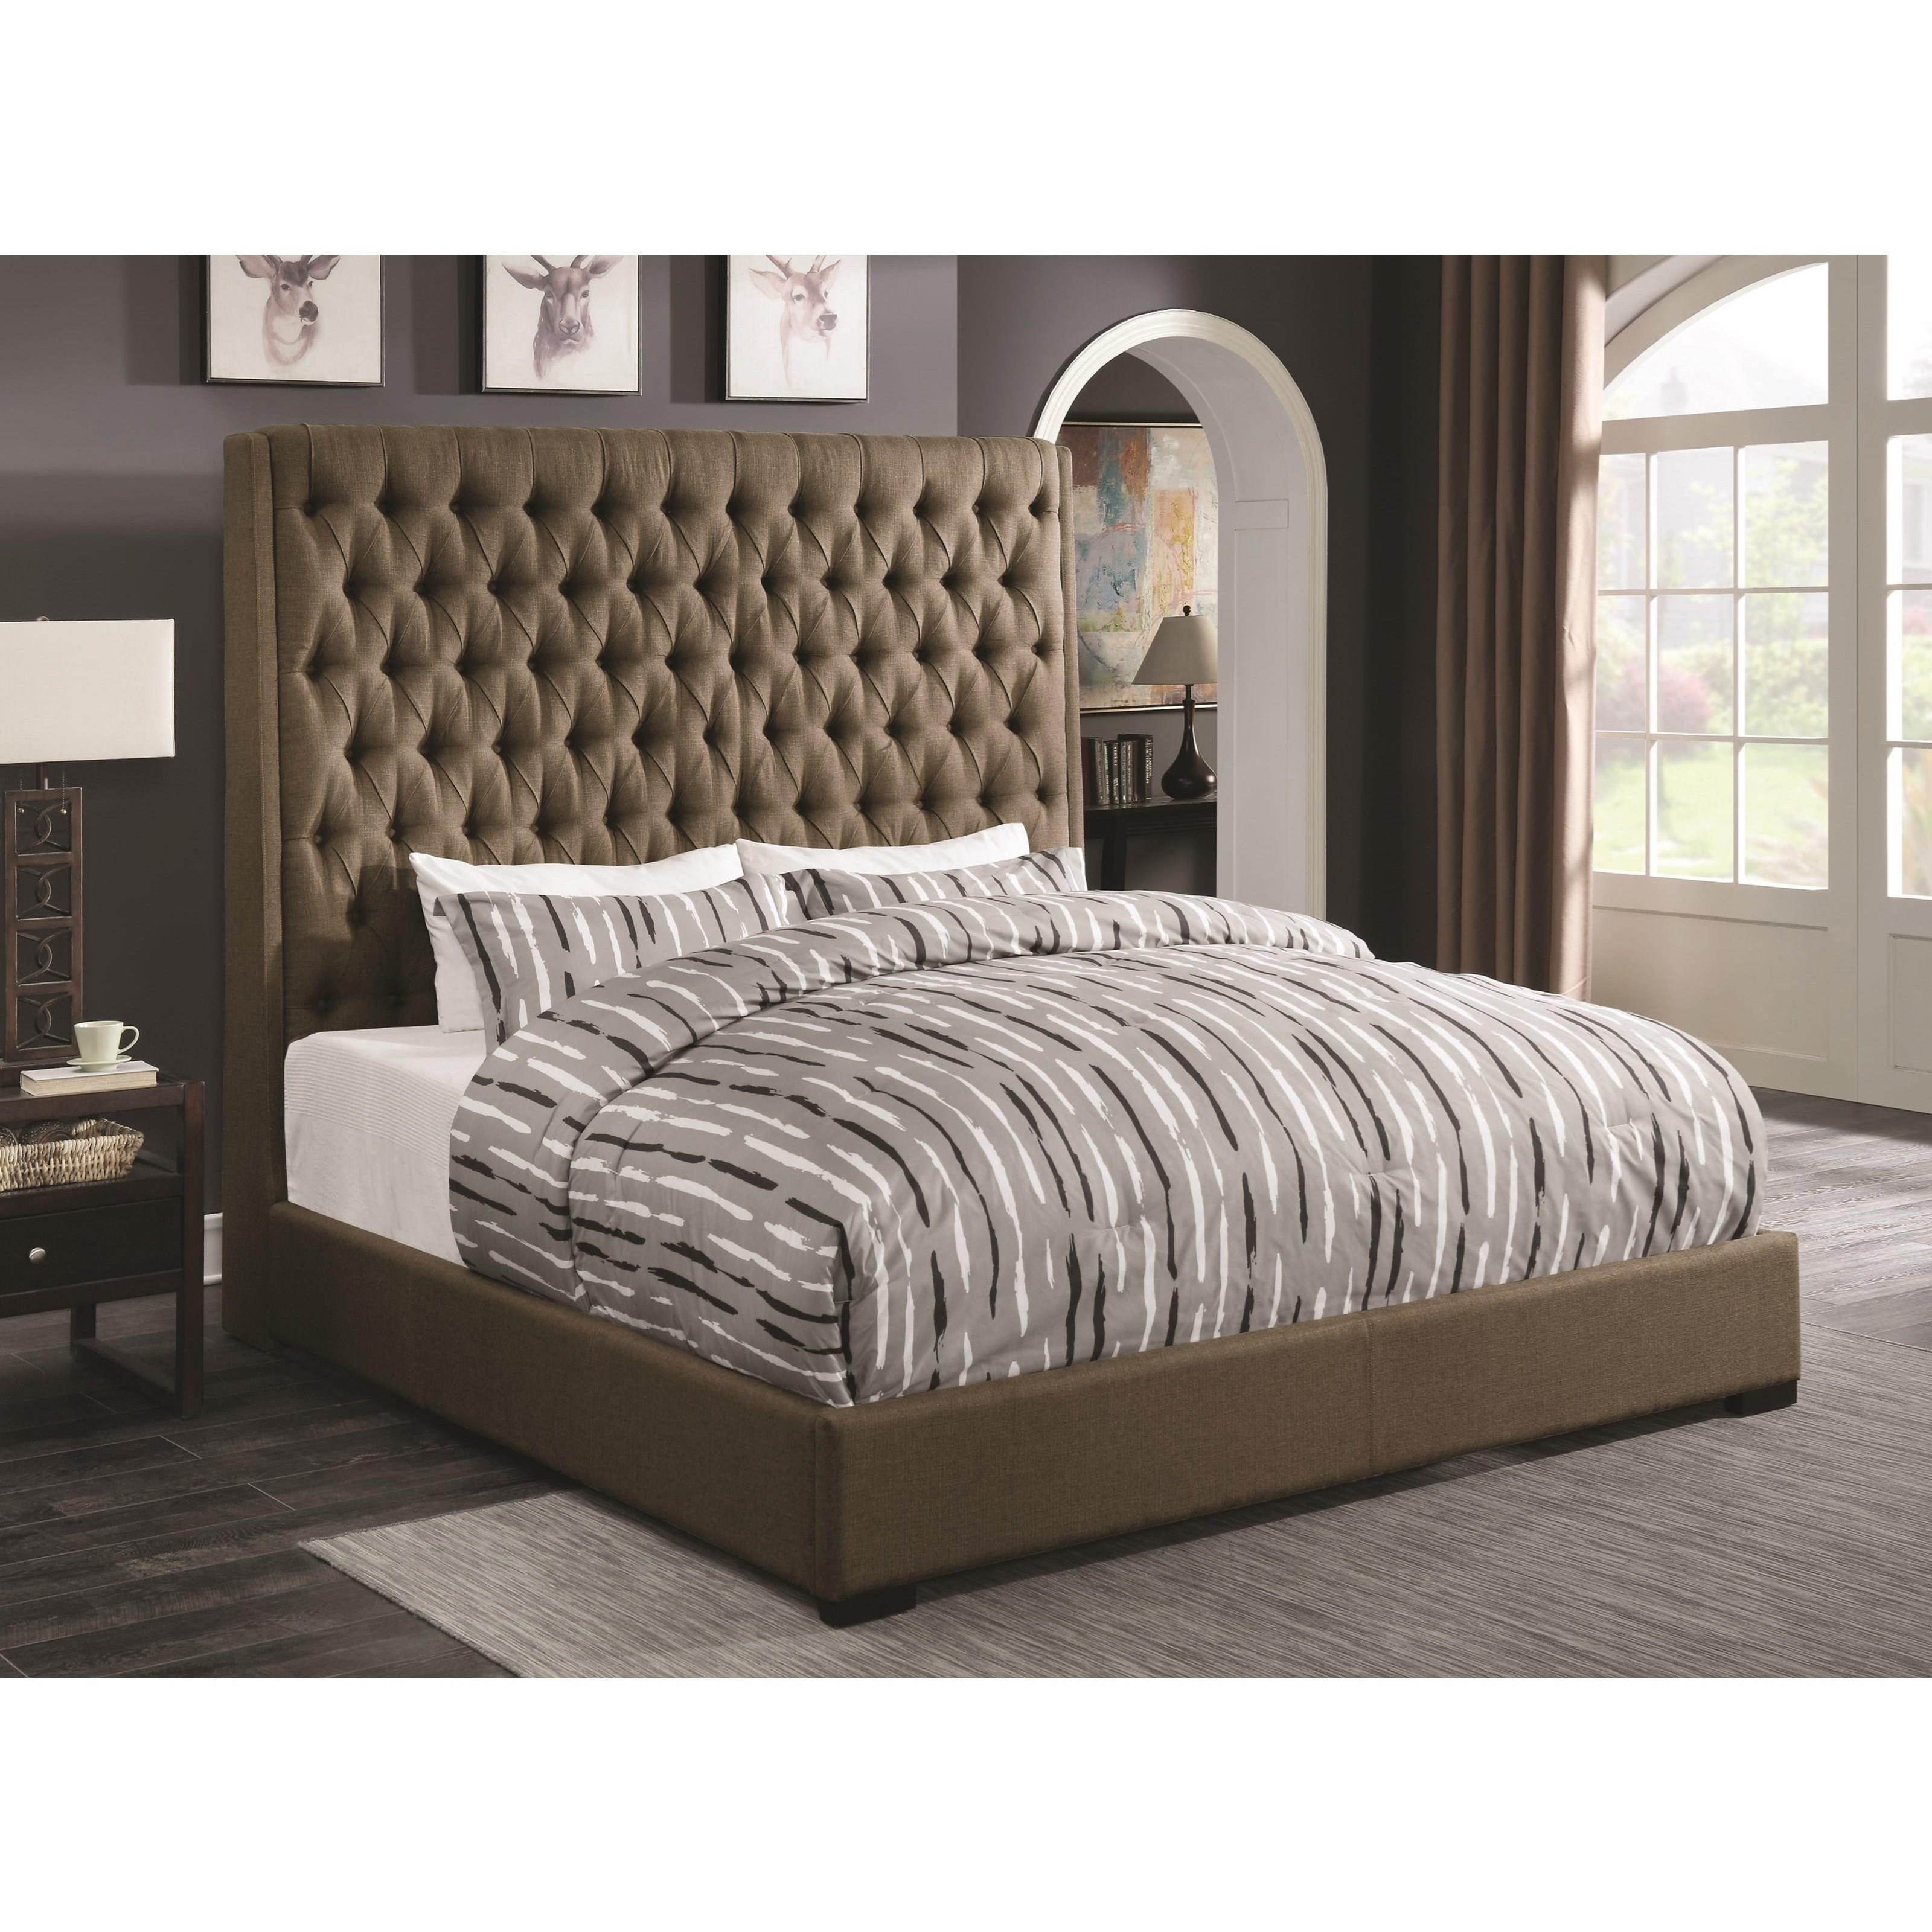 Coaster Upholstered Beds Cal King Bed - Item Number: 300721KW